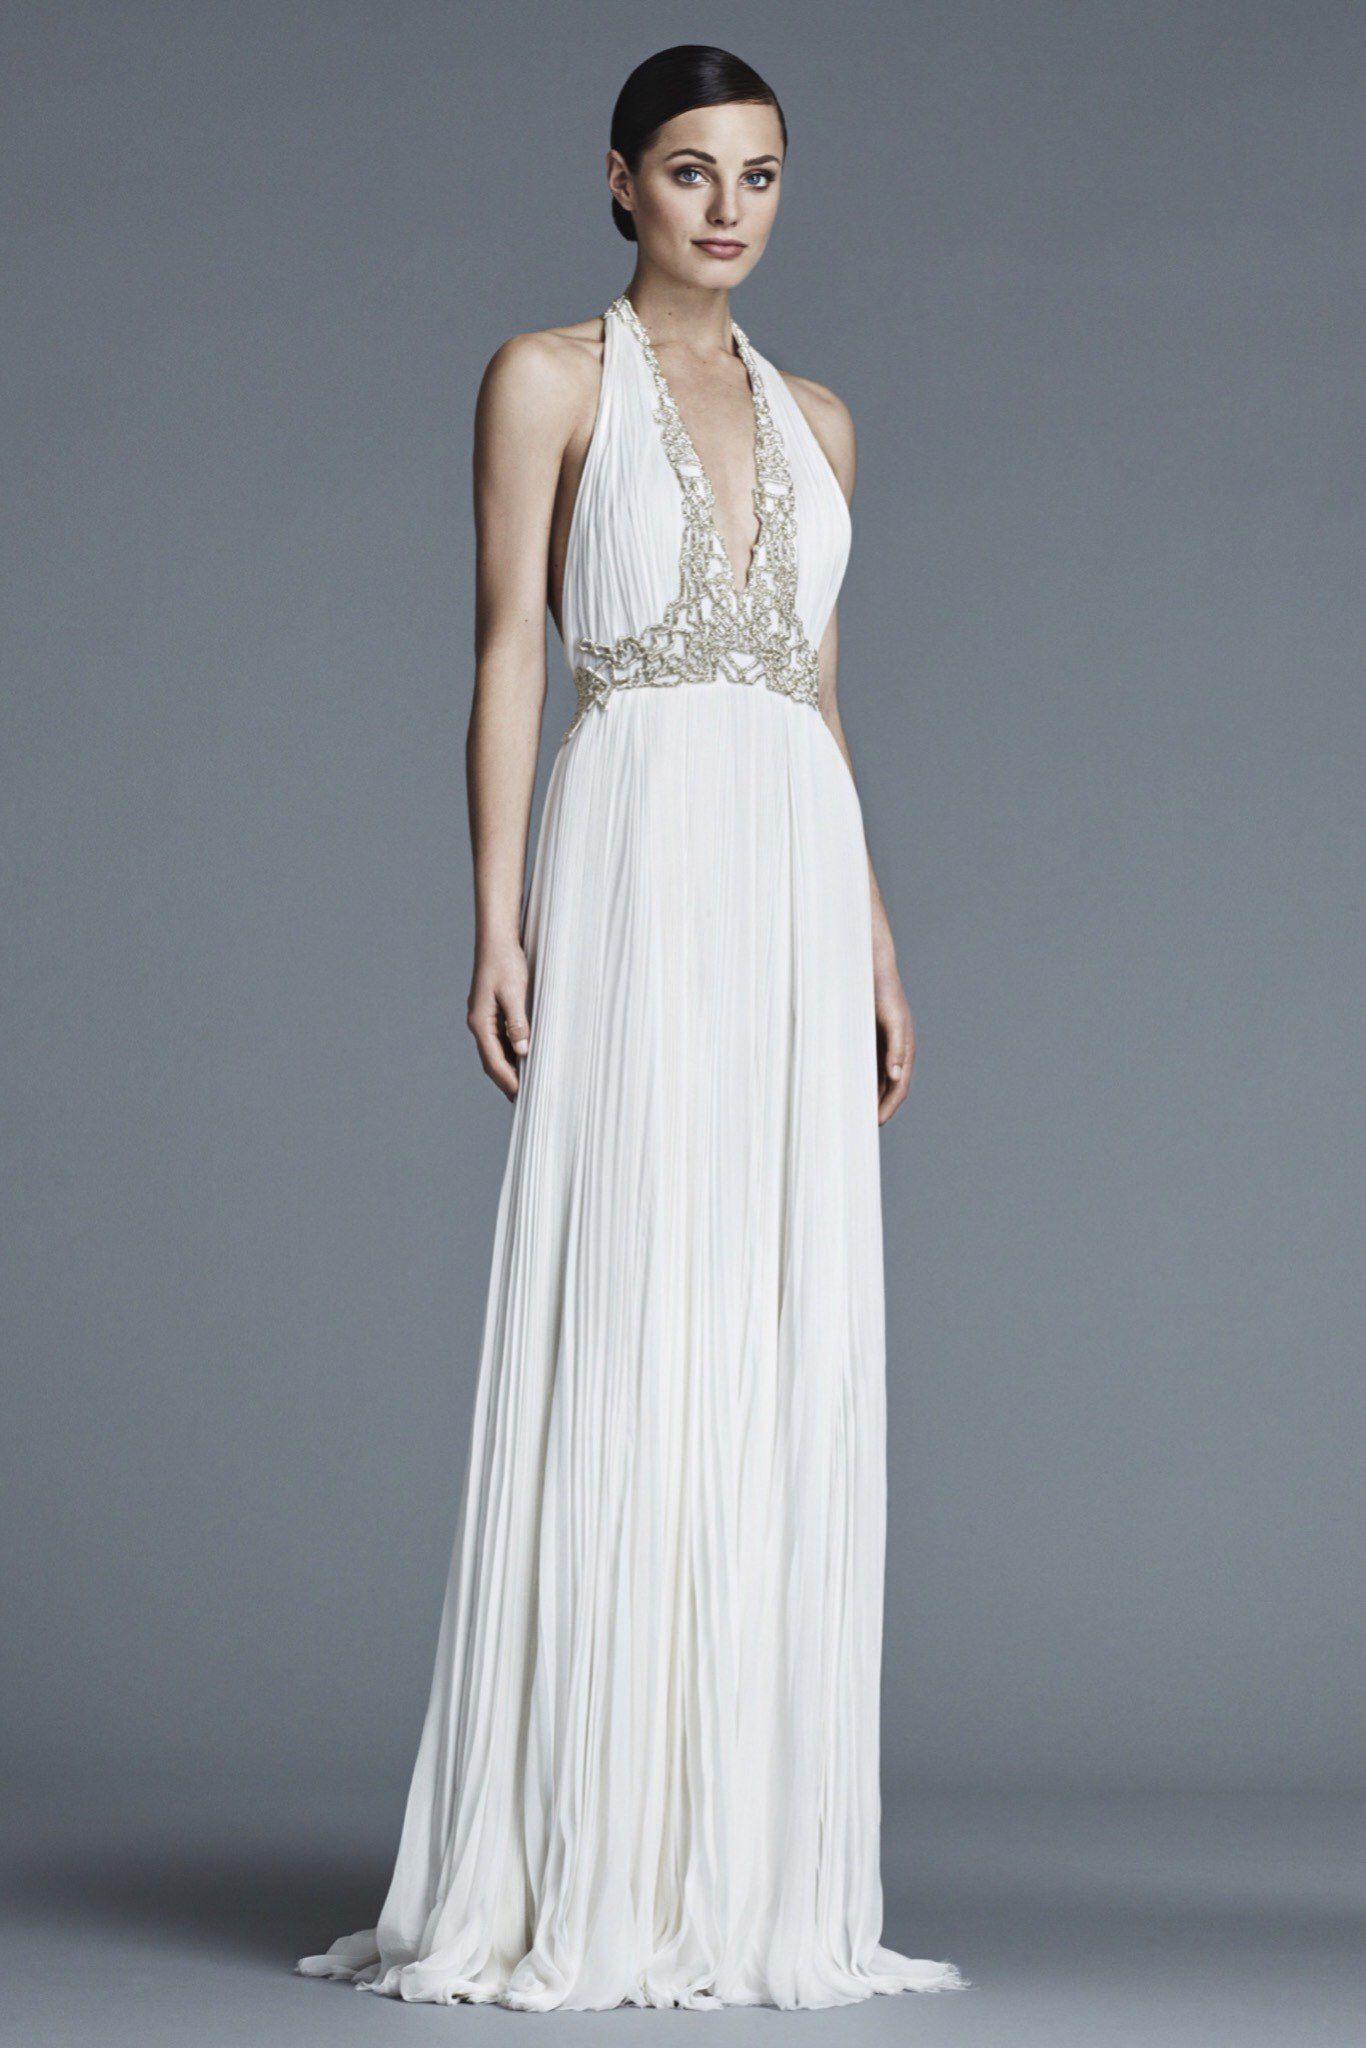 J. Mendel Bridal Spring 2016 Fashion Show   Brautkleid ...